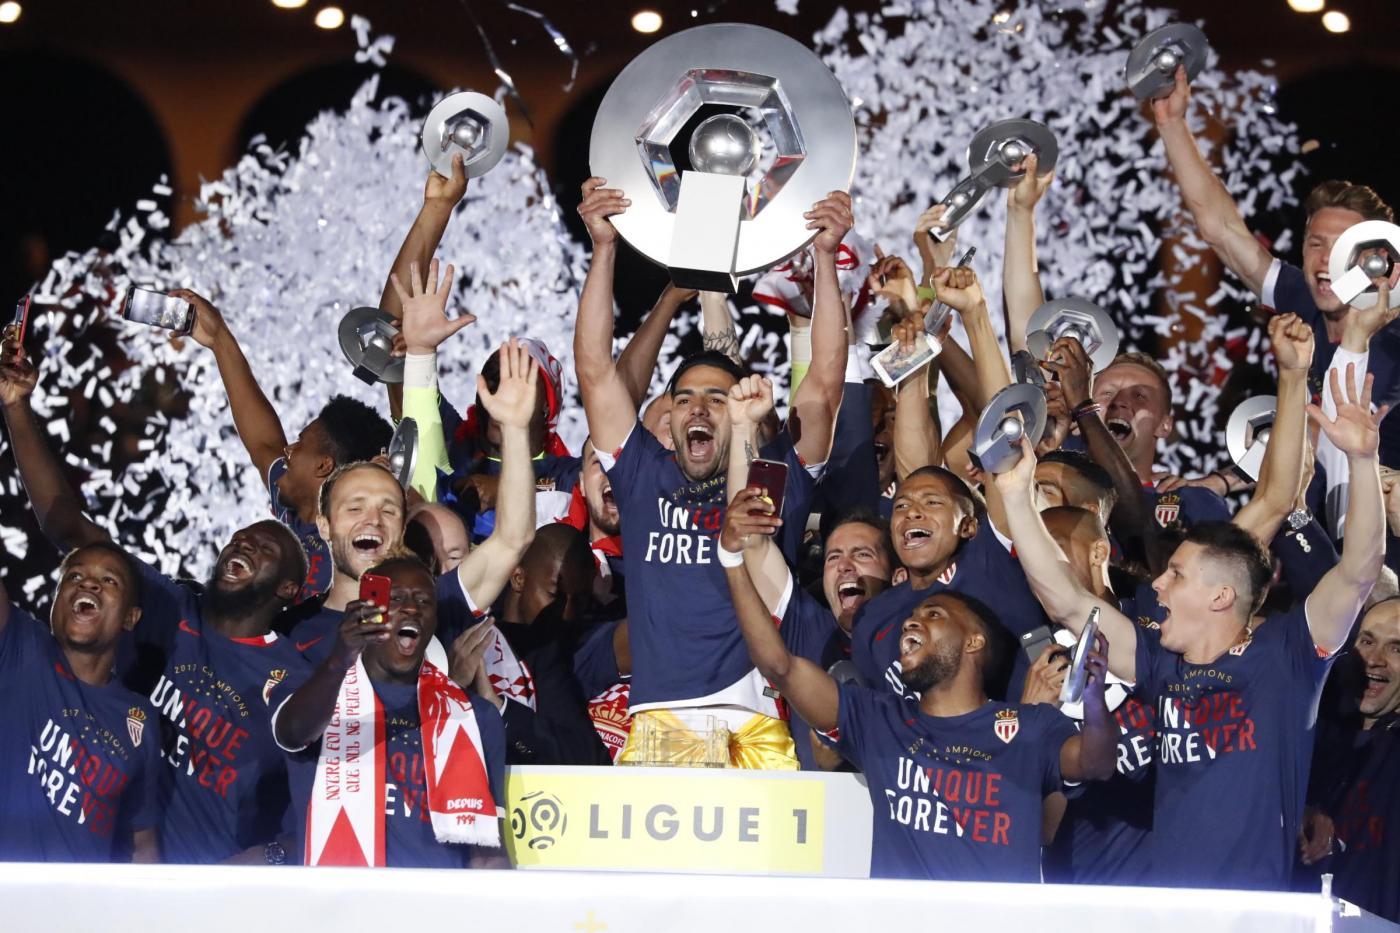 Calendario Ligue 1.Calendario Ligue 1 2017 2018 Inizio In Casa Per Monaco E Psg